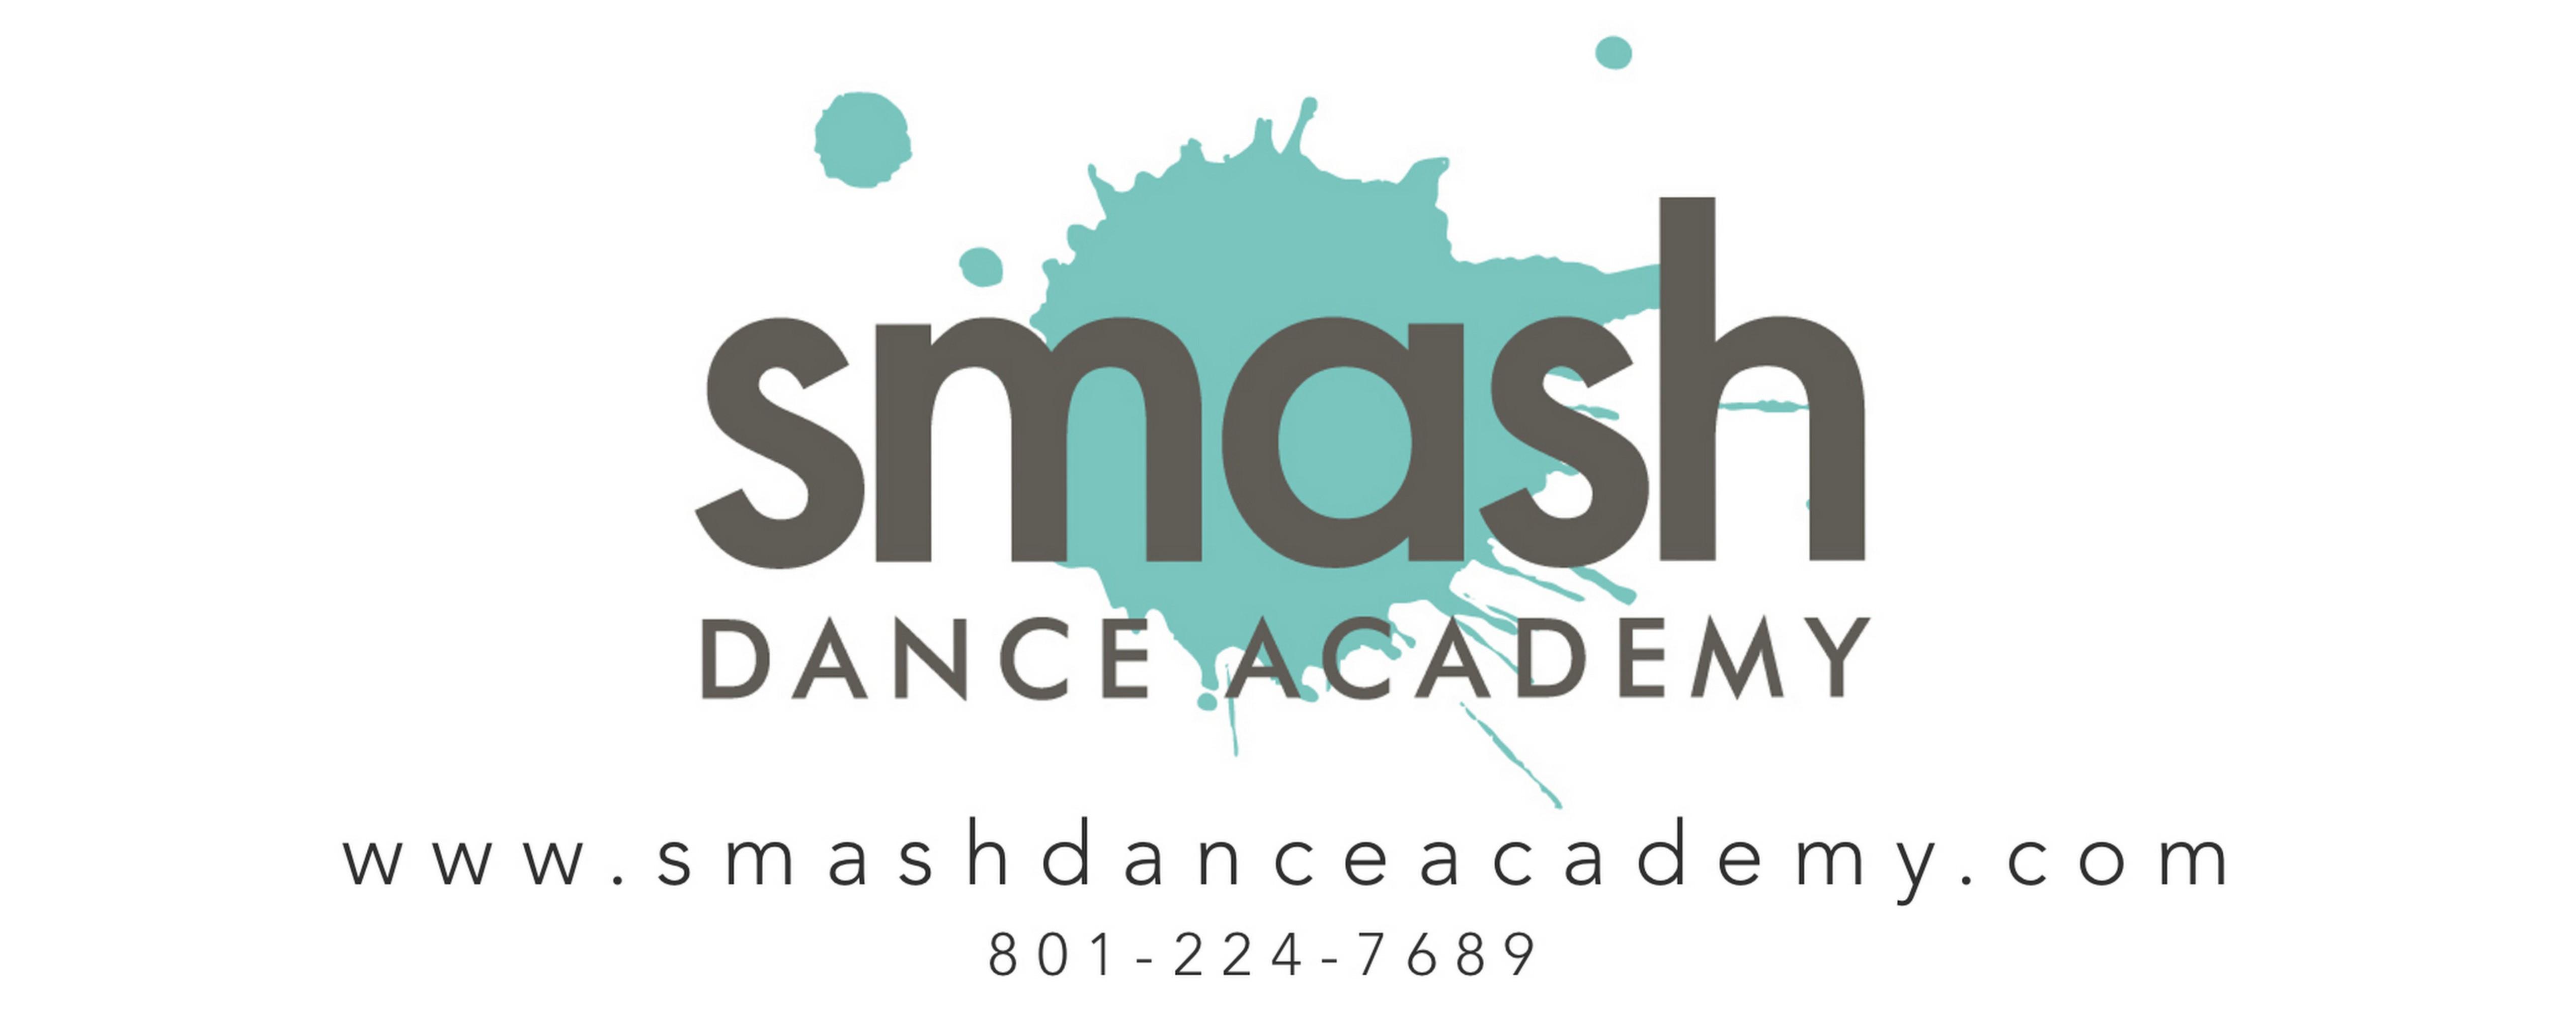 Smash dance 2